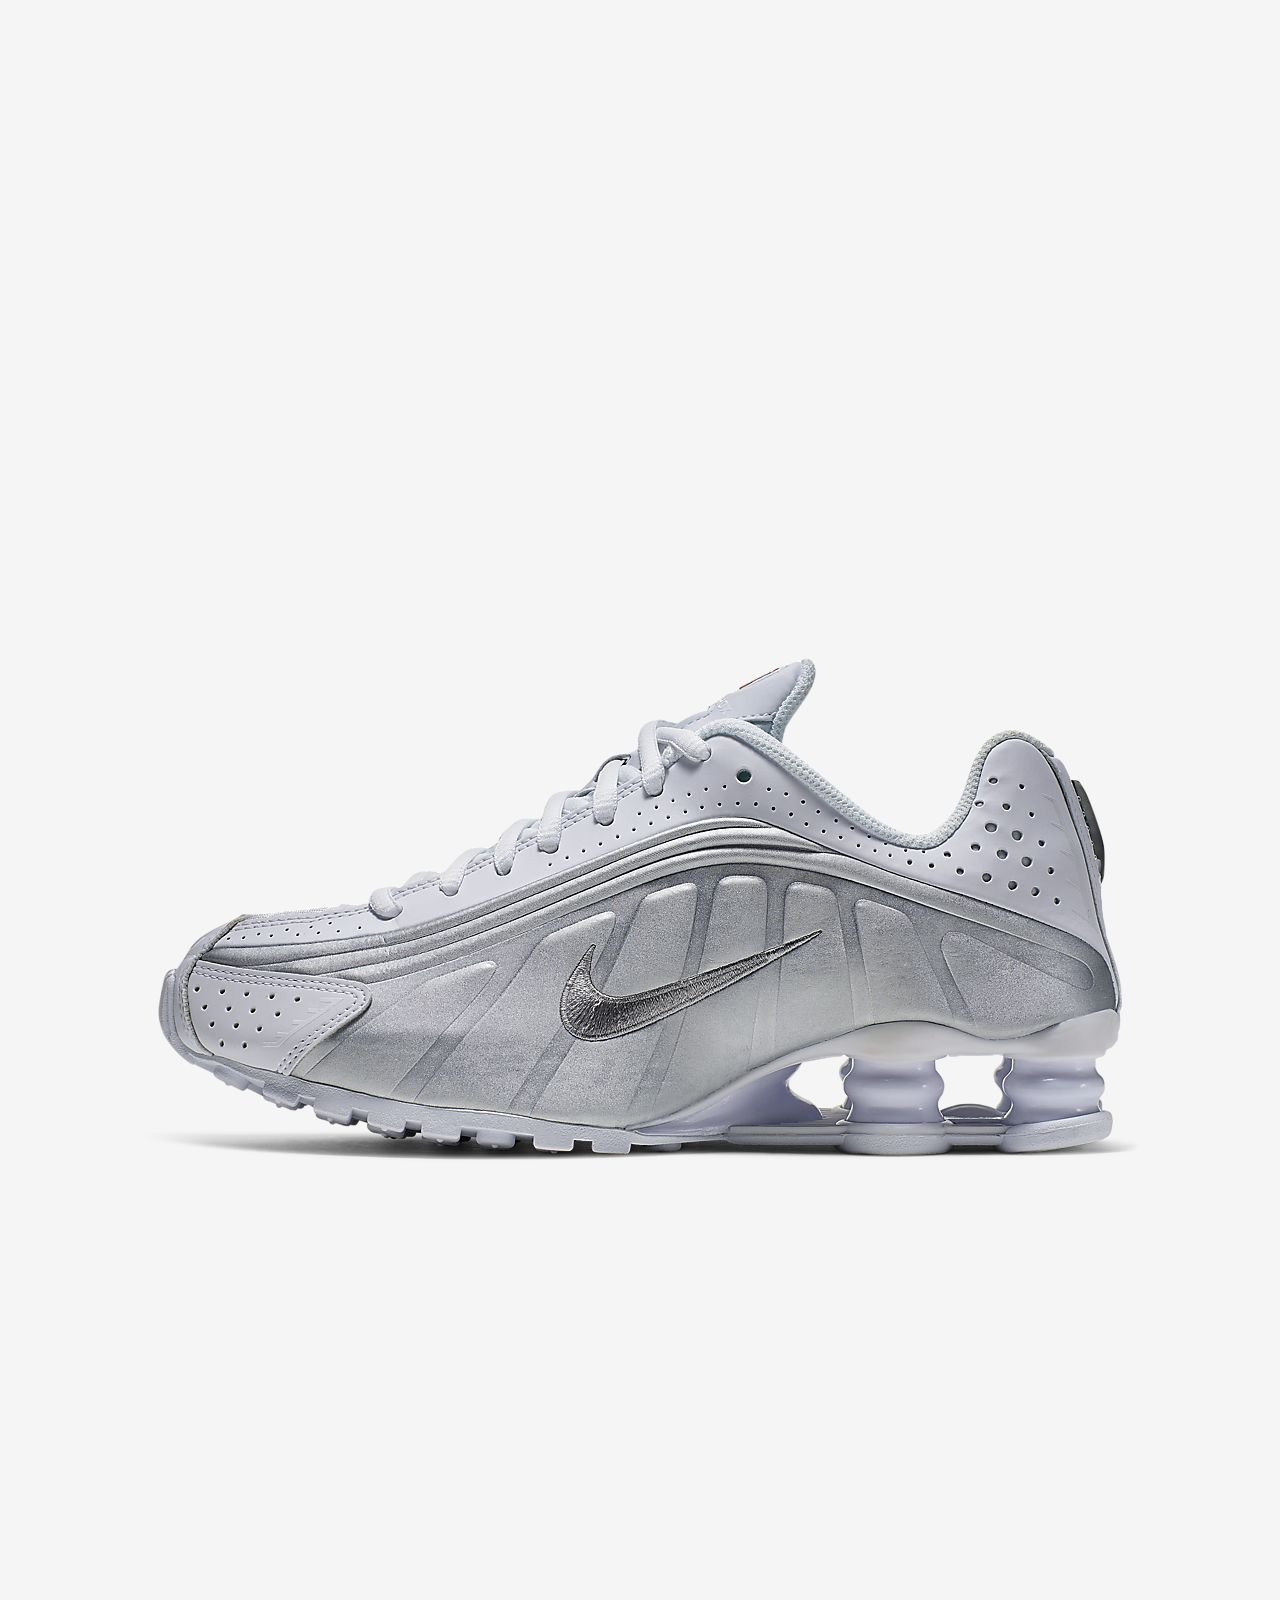 Nike Shox R4 Schuh für ältere Kinder